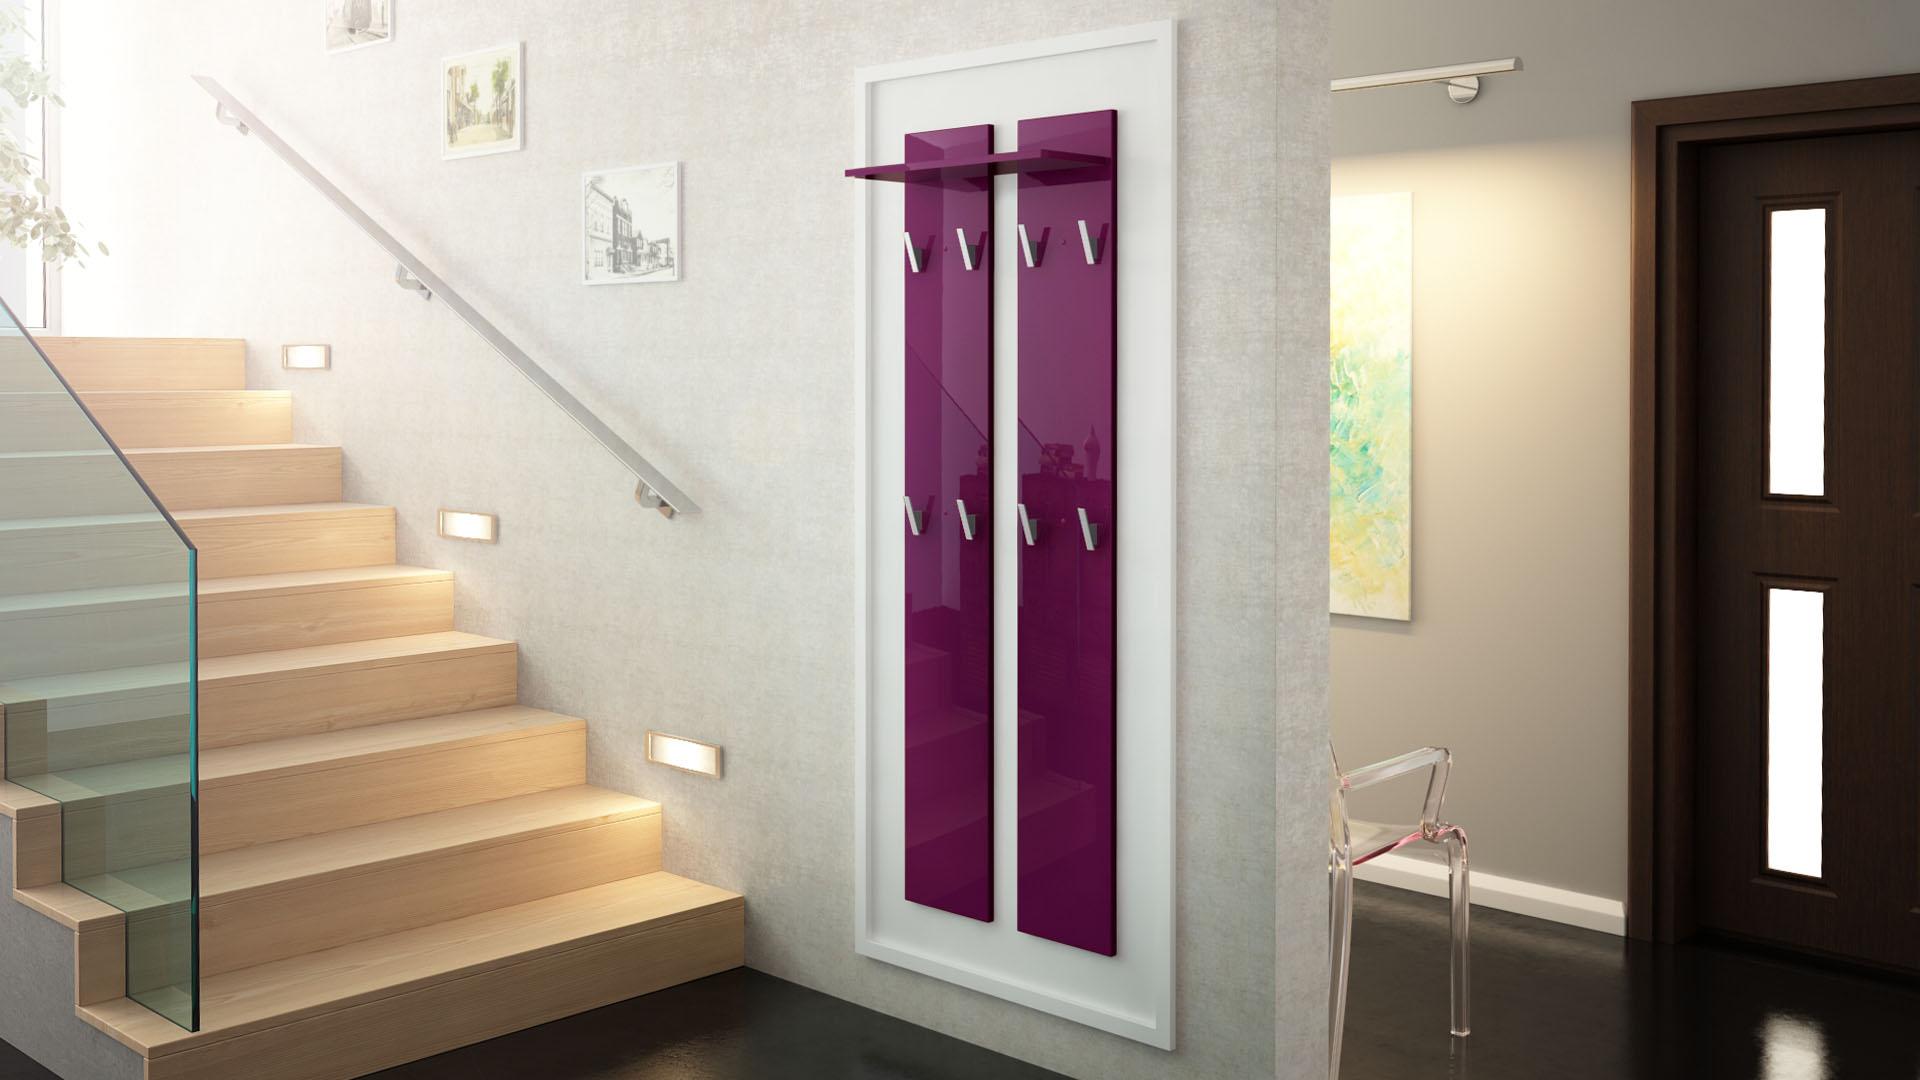 garderobenpaneel wandgarderobe garderobe wandpaneel 170 hochglanz naturt ne ebay. Black Bedroom Furniture Sets. Home Design Ideas